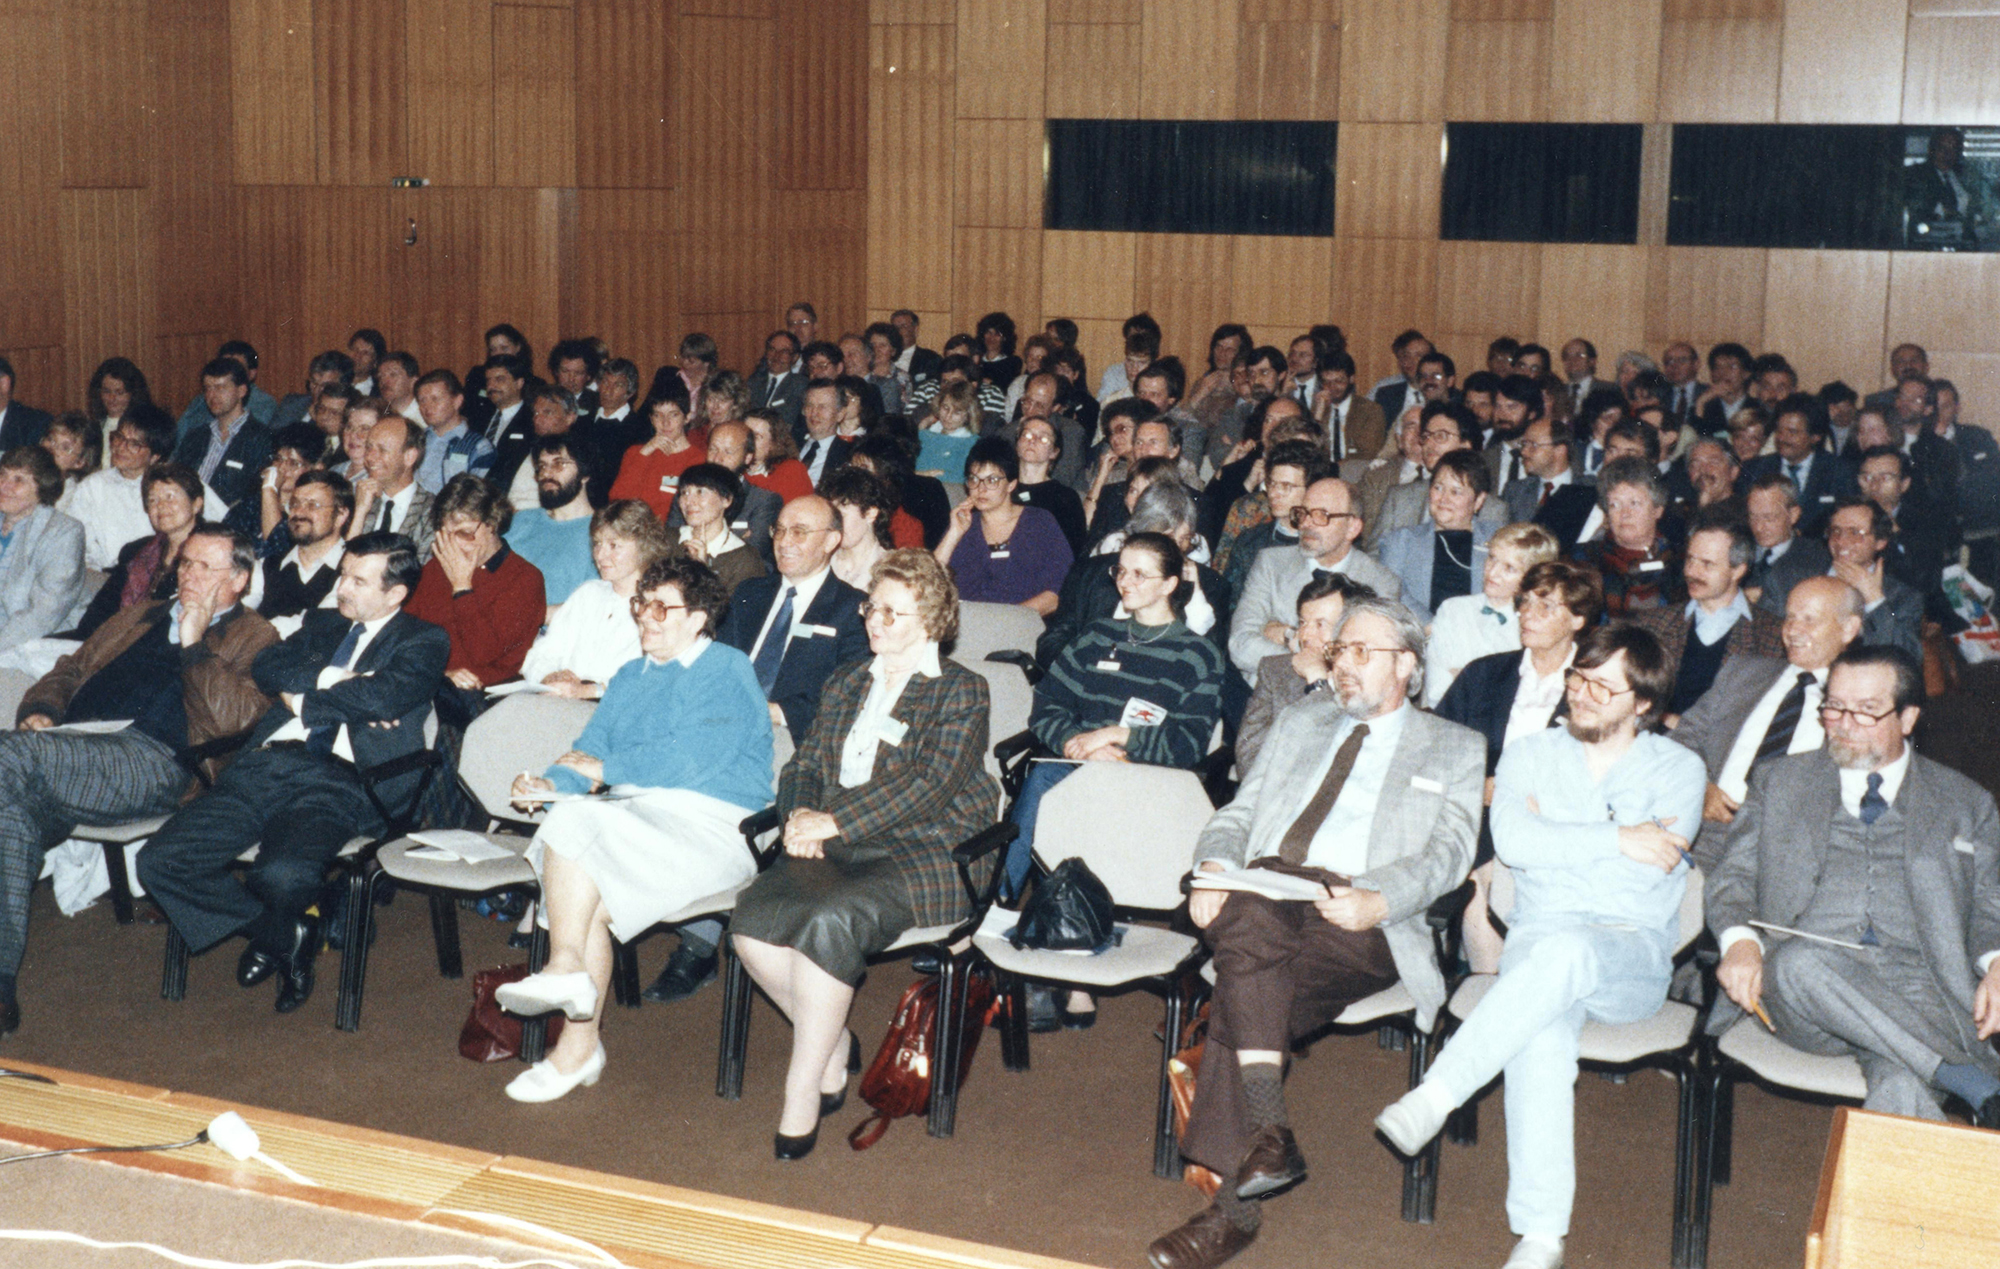 Marianne Englert 1988 in Stuttgart (in der ersten Reihe Alfred Pressl Anni Anders Englert ganz rechts Herbert Hess)